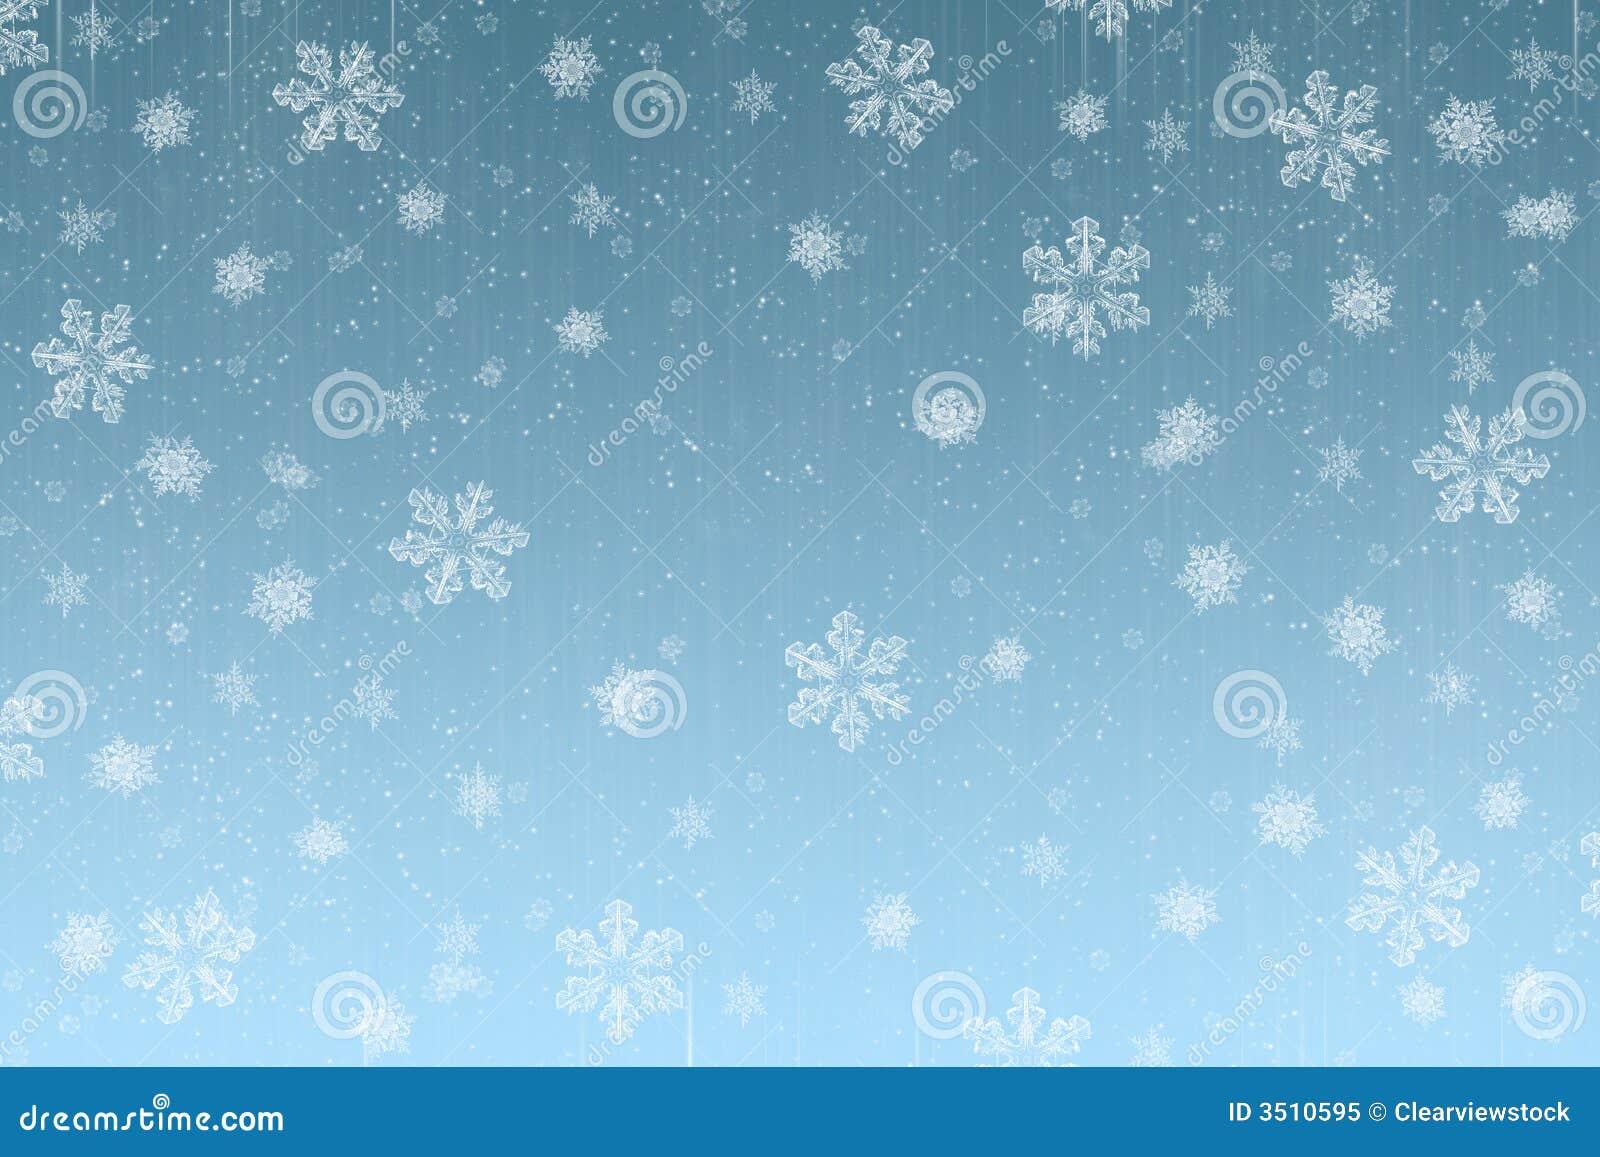 Snowing Christmas Scene.Christmas Snow Scene Card Stock Illustration Illustration